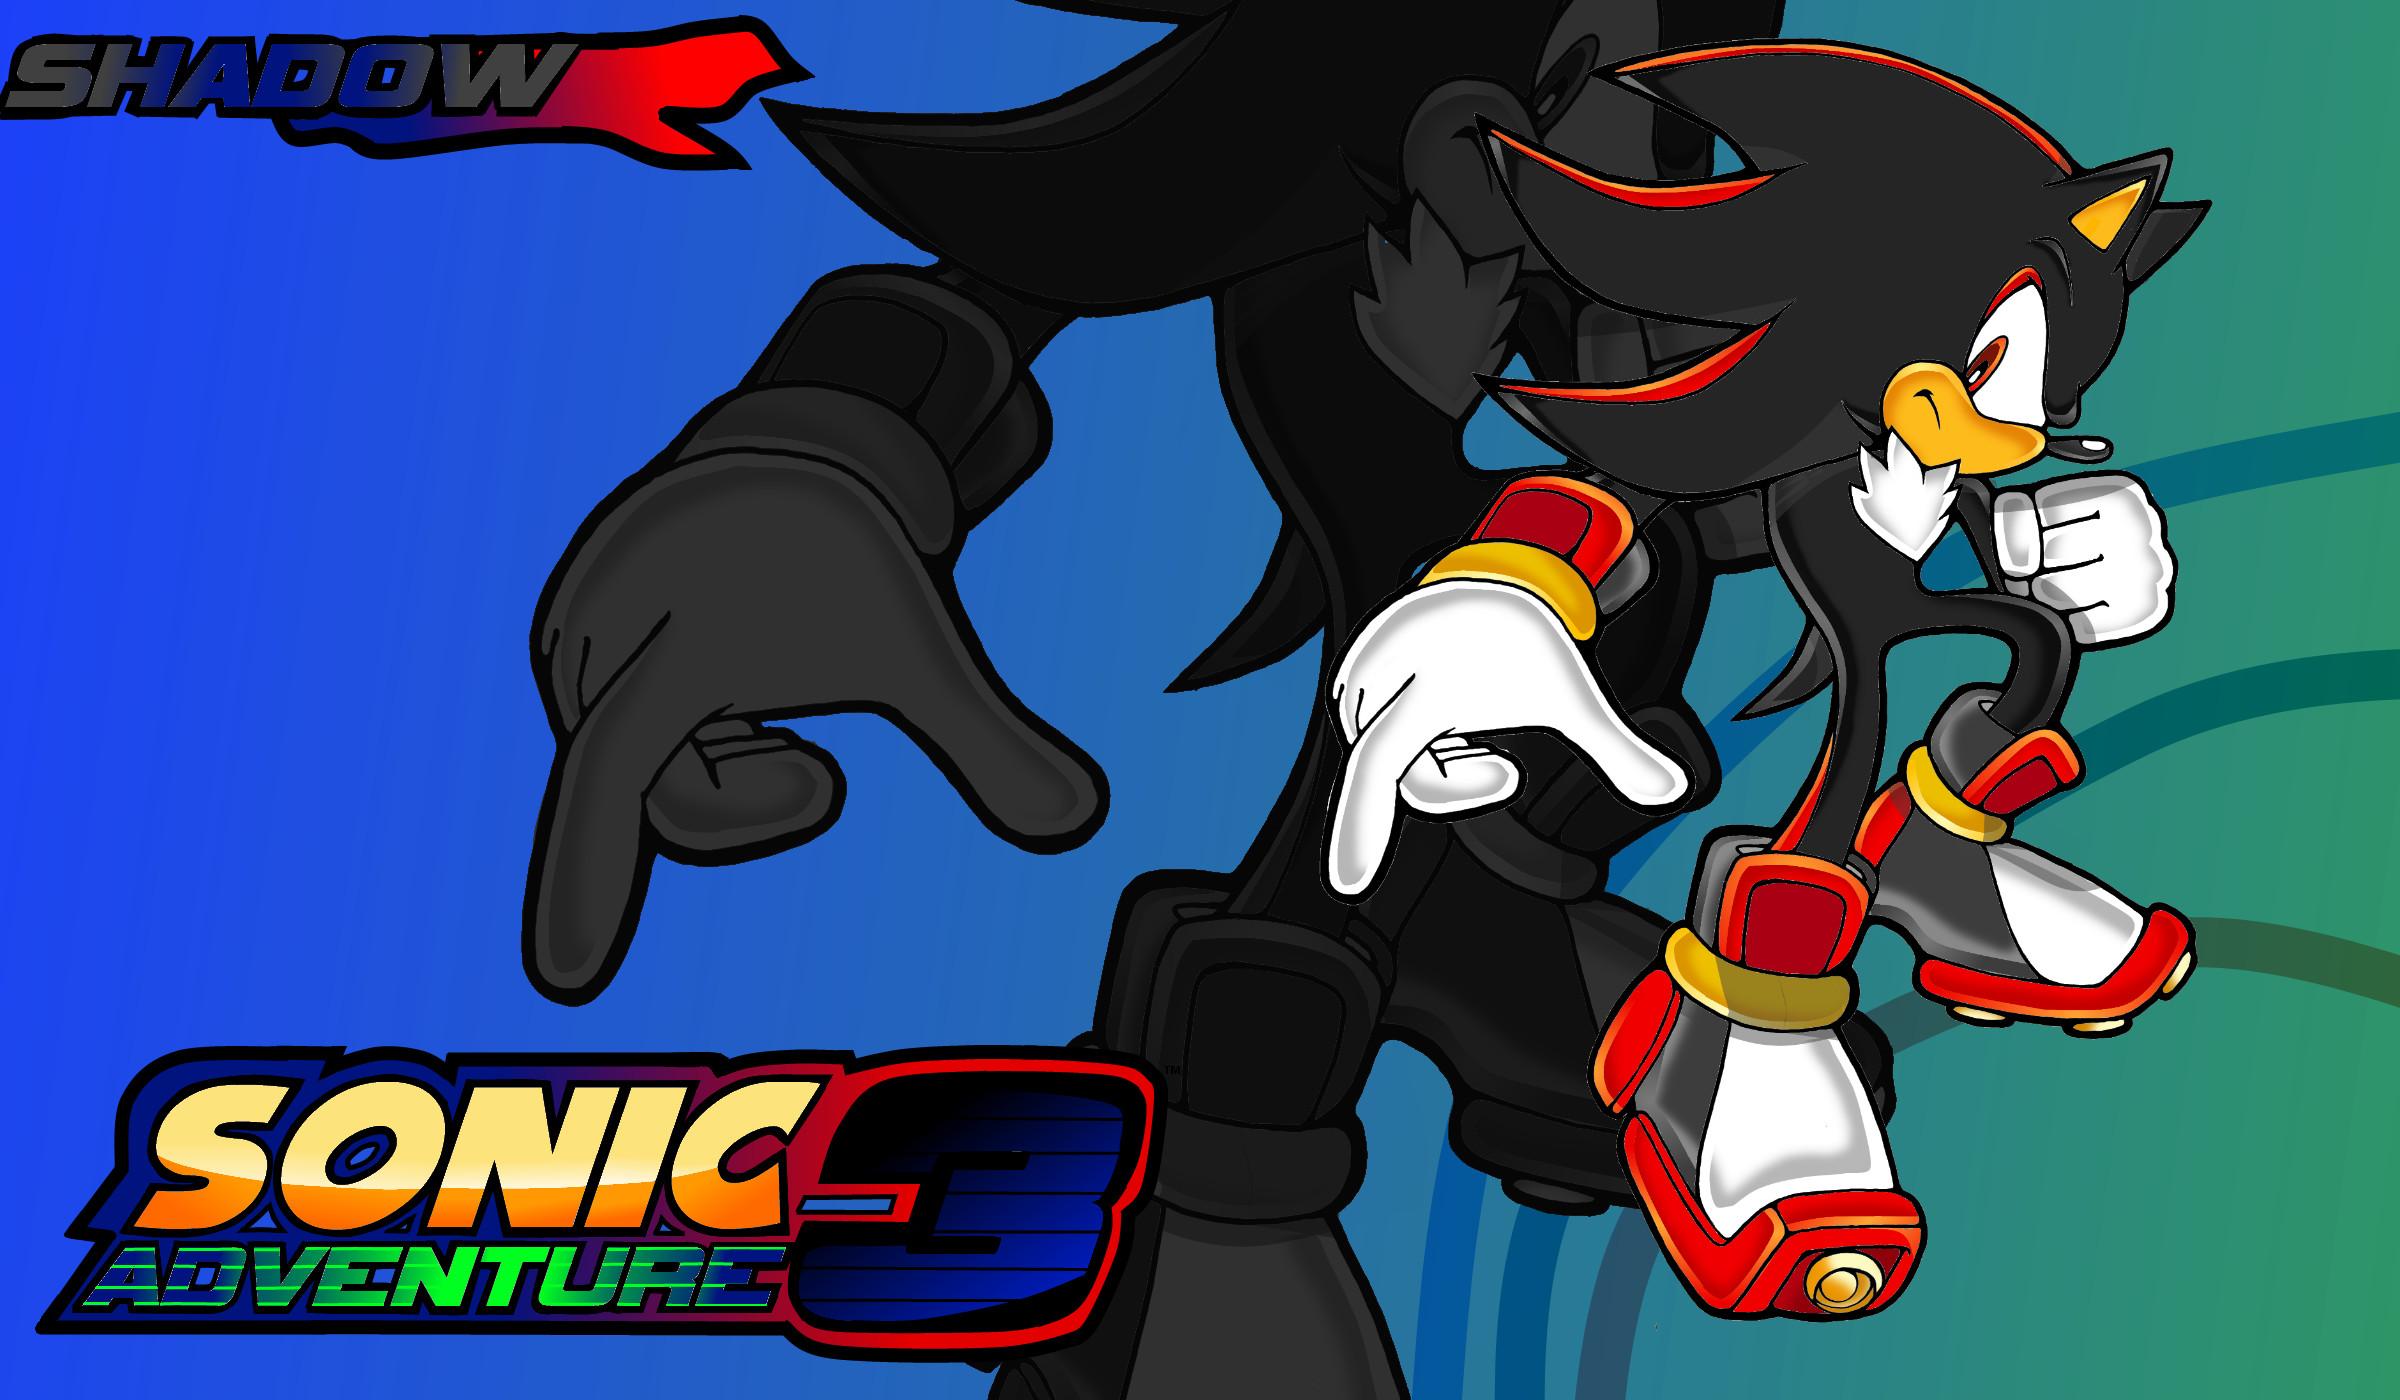 Sonic Adventure Wallpaper (67+ images)